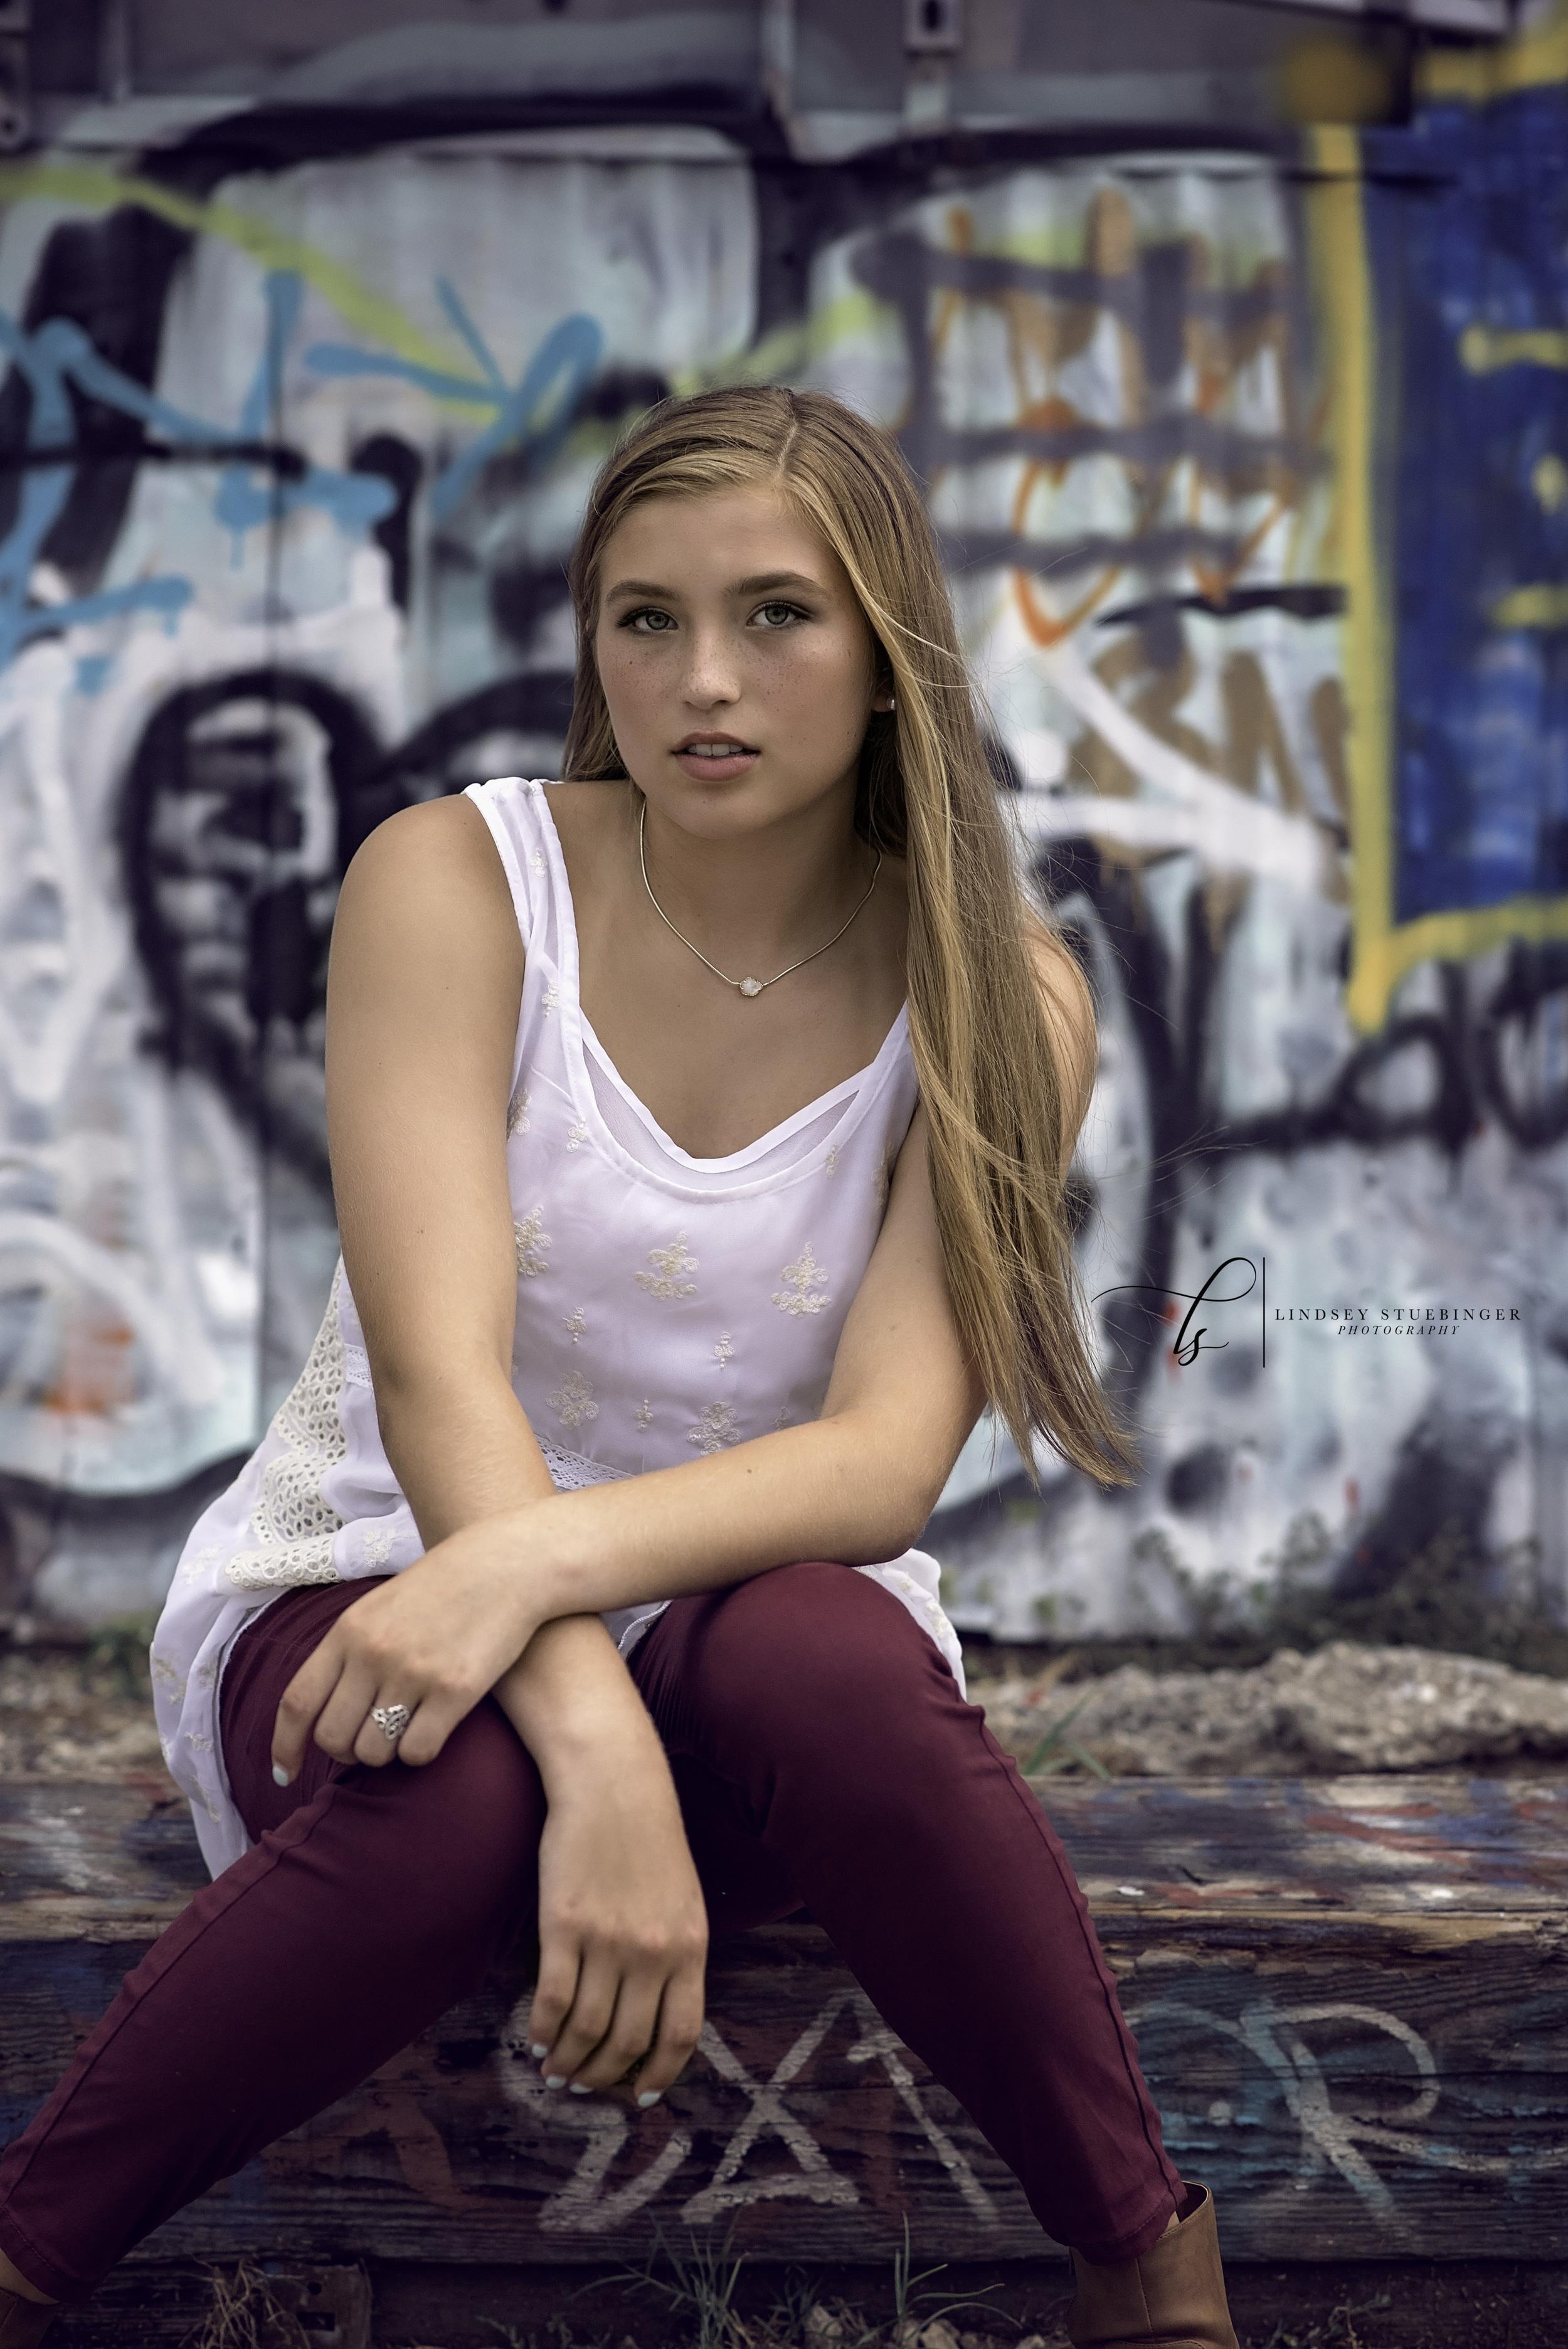 Model: Mikaila Schmidt